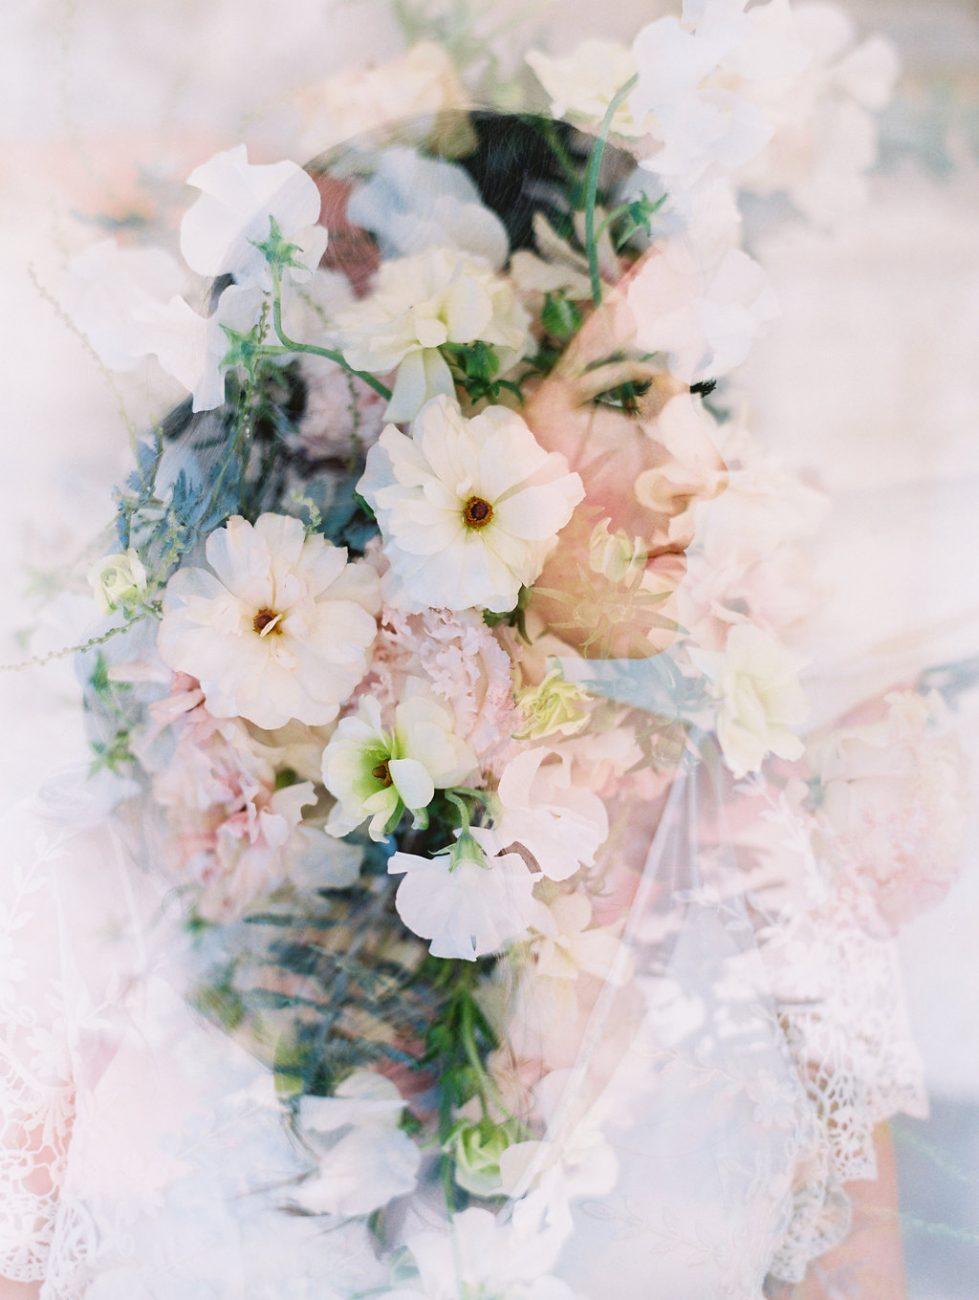 Orange Country wedding inspiration flowers double exposure